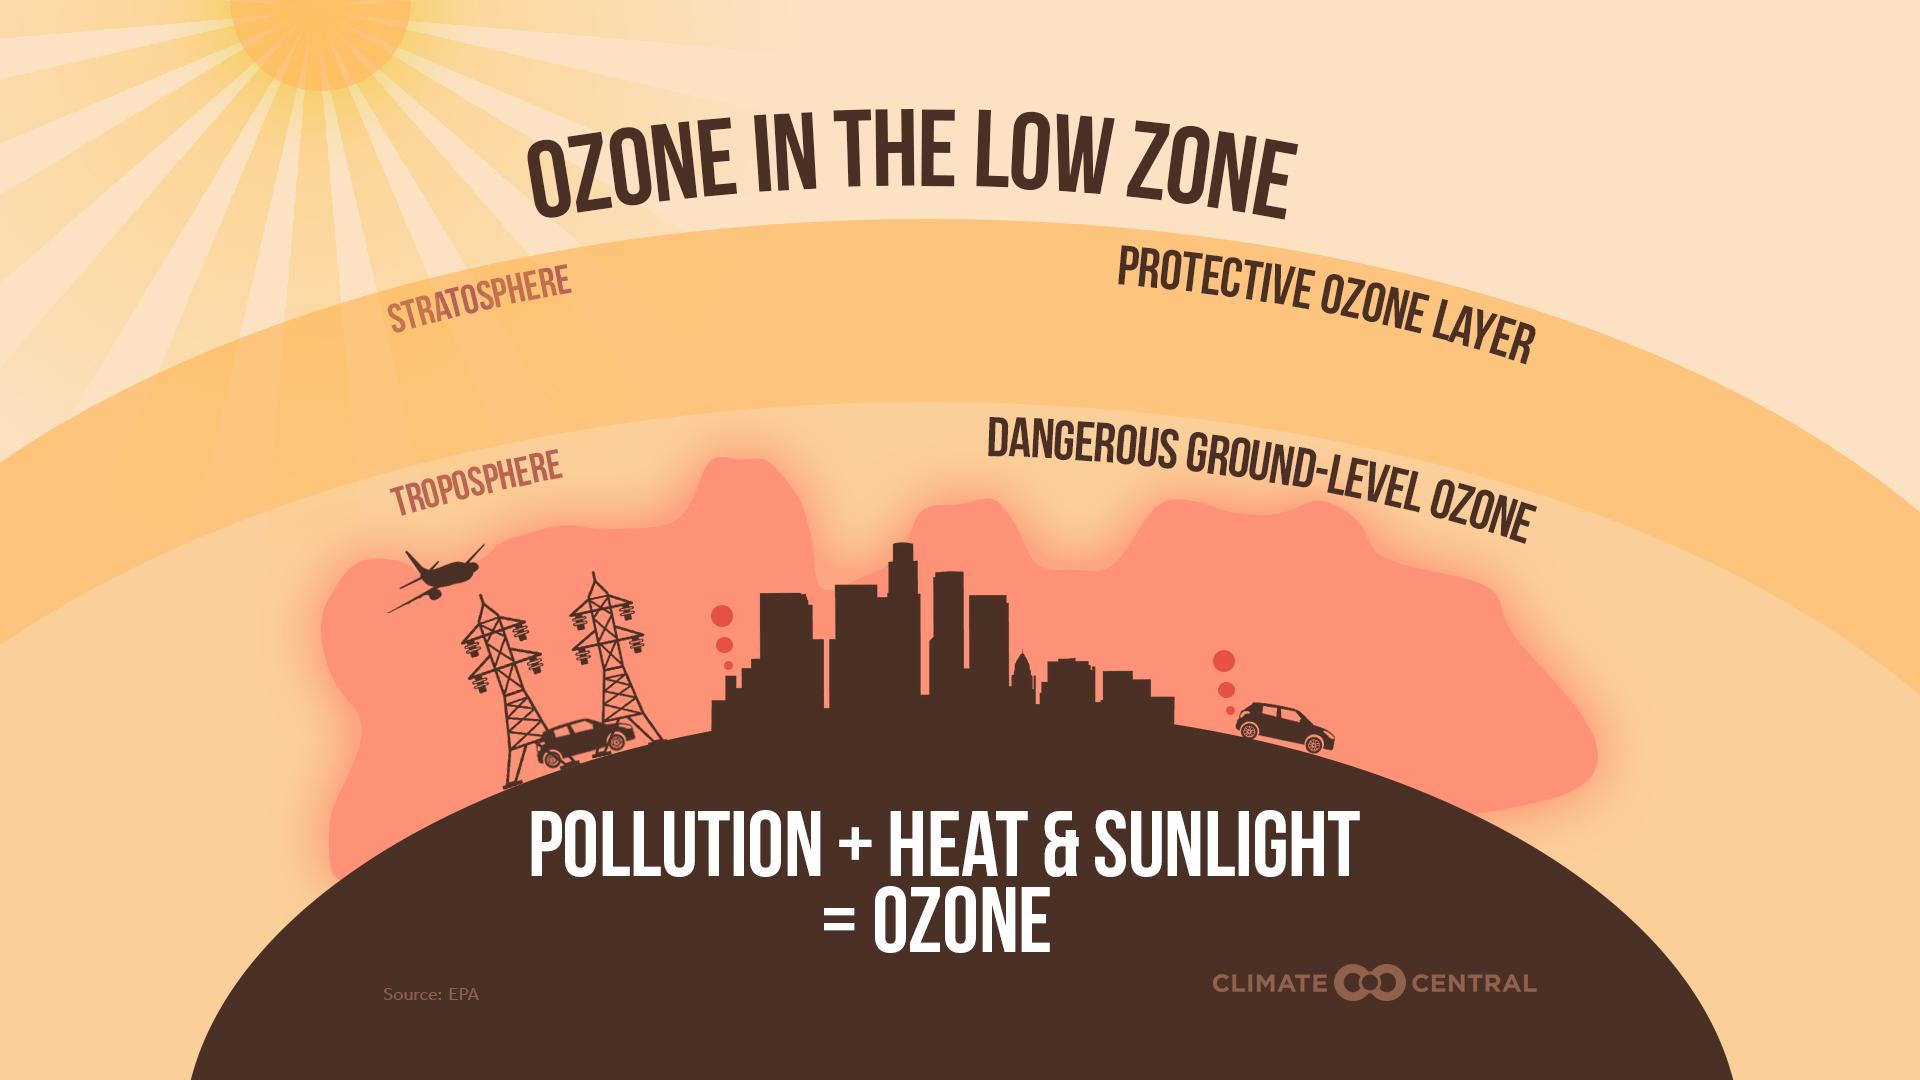 2019AirQuality2_OzoneExplainer_en_title_lg.jpg